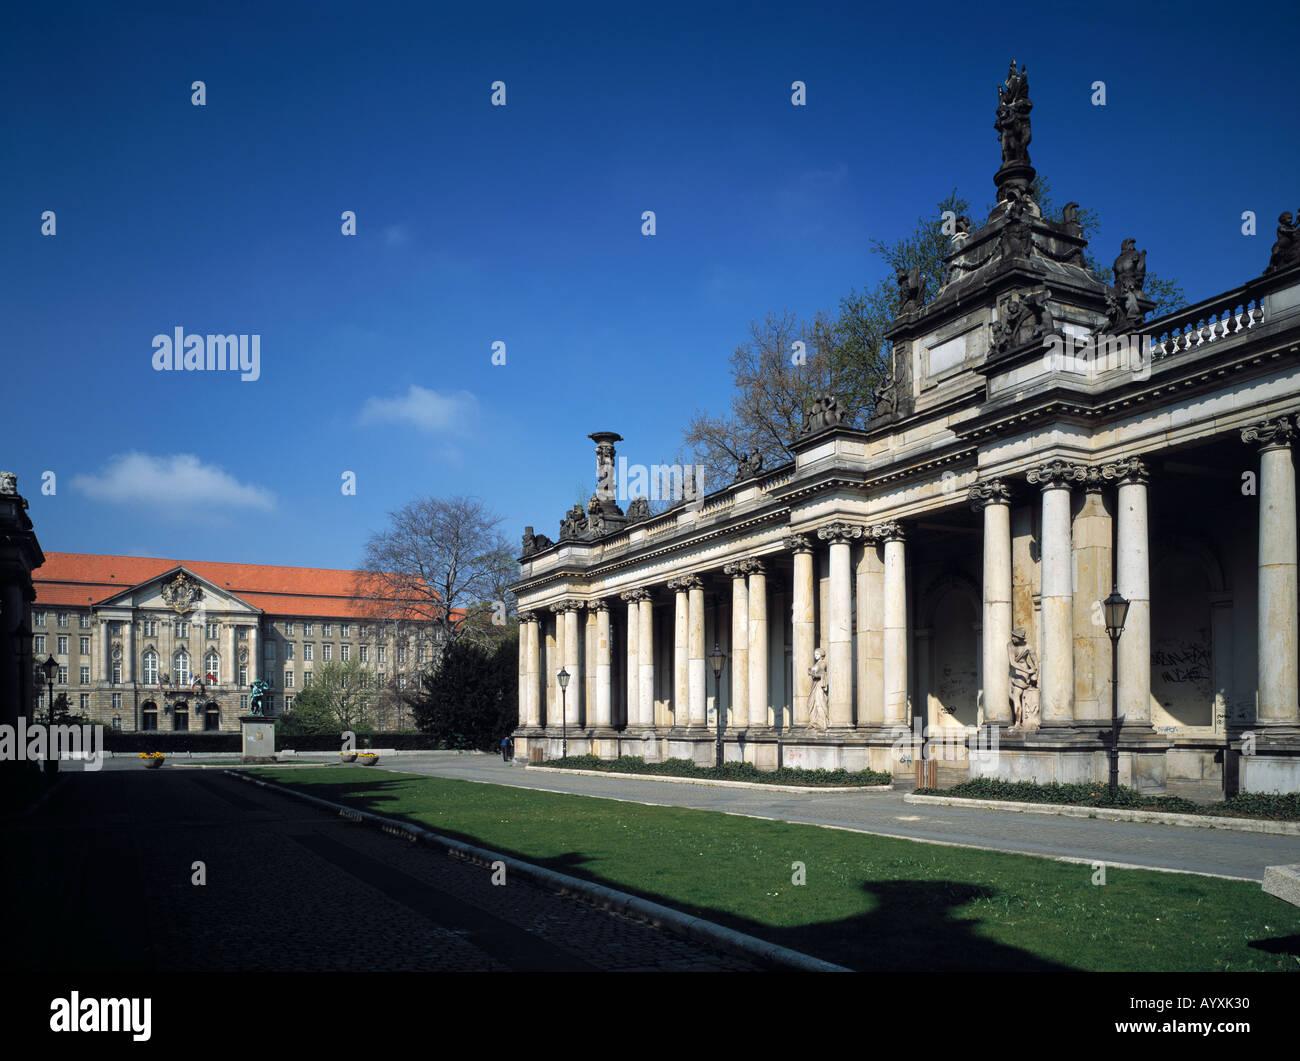 Gebaeude vom Kontrollrat der Alliierten in Berlin, Koenigskolonnaden, Berlin - Stock Image